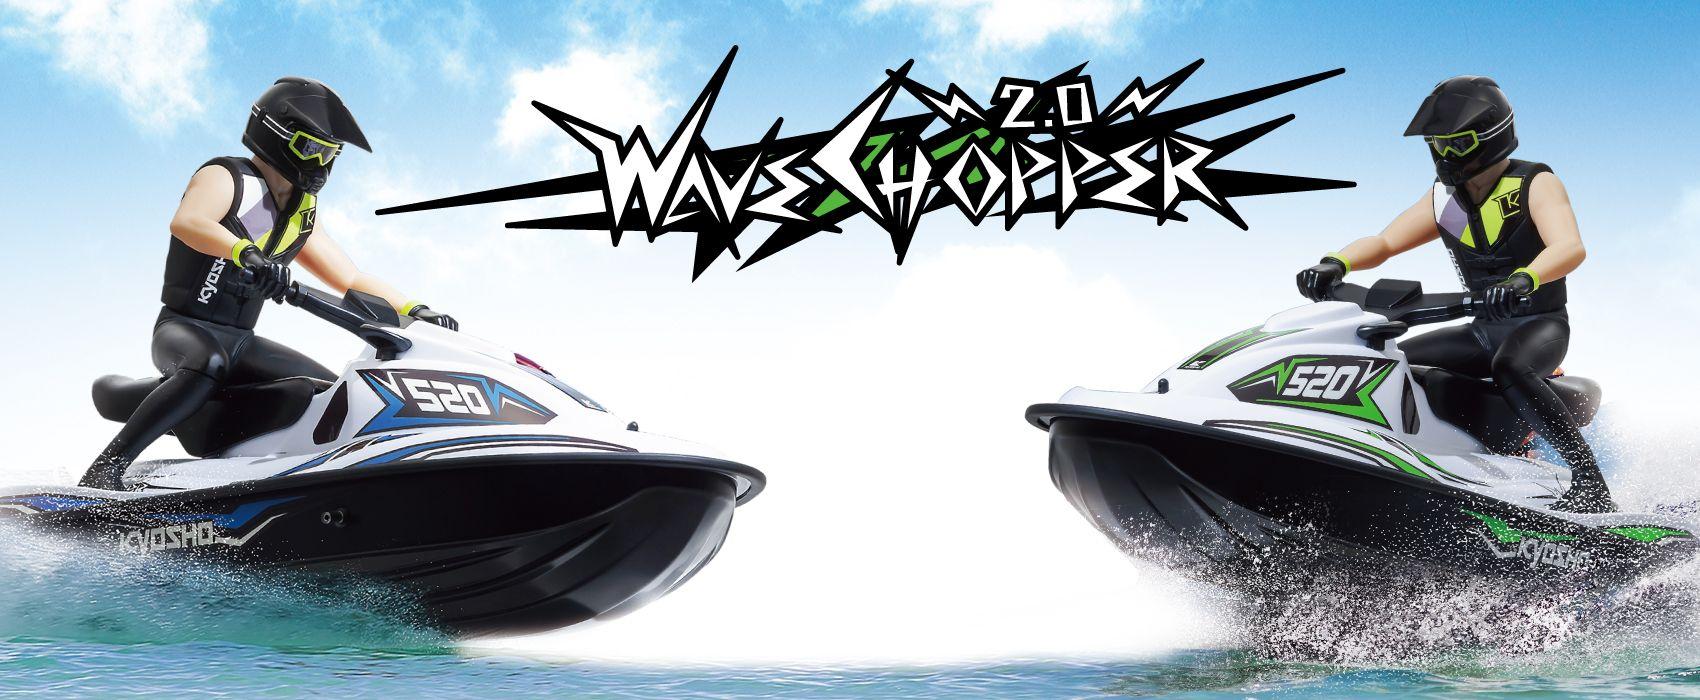 banner wavechopper 1700x700px